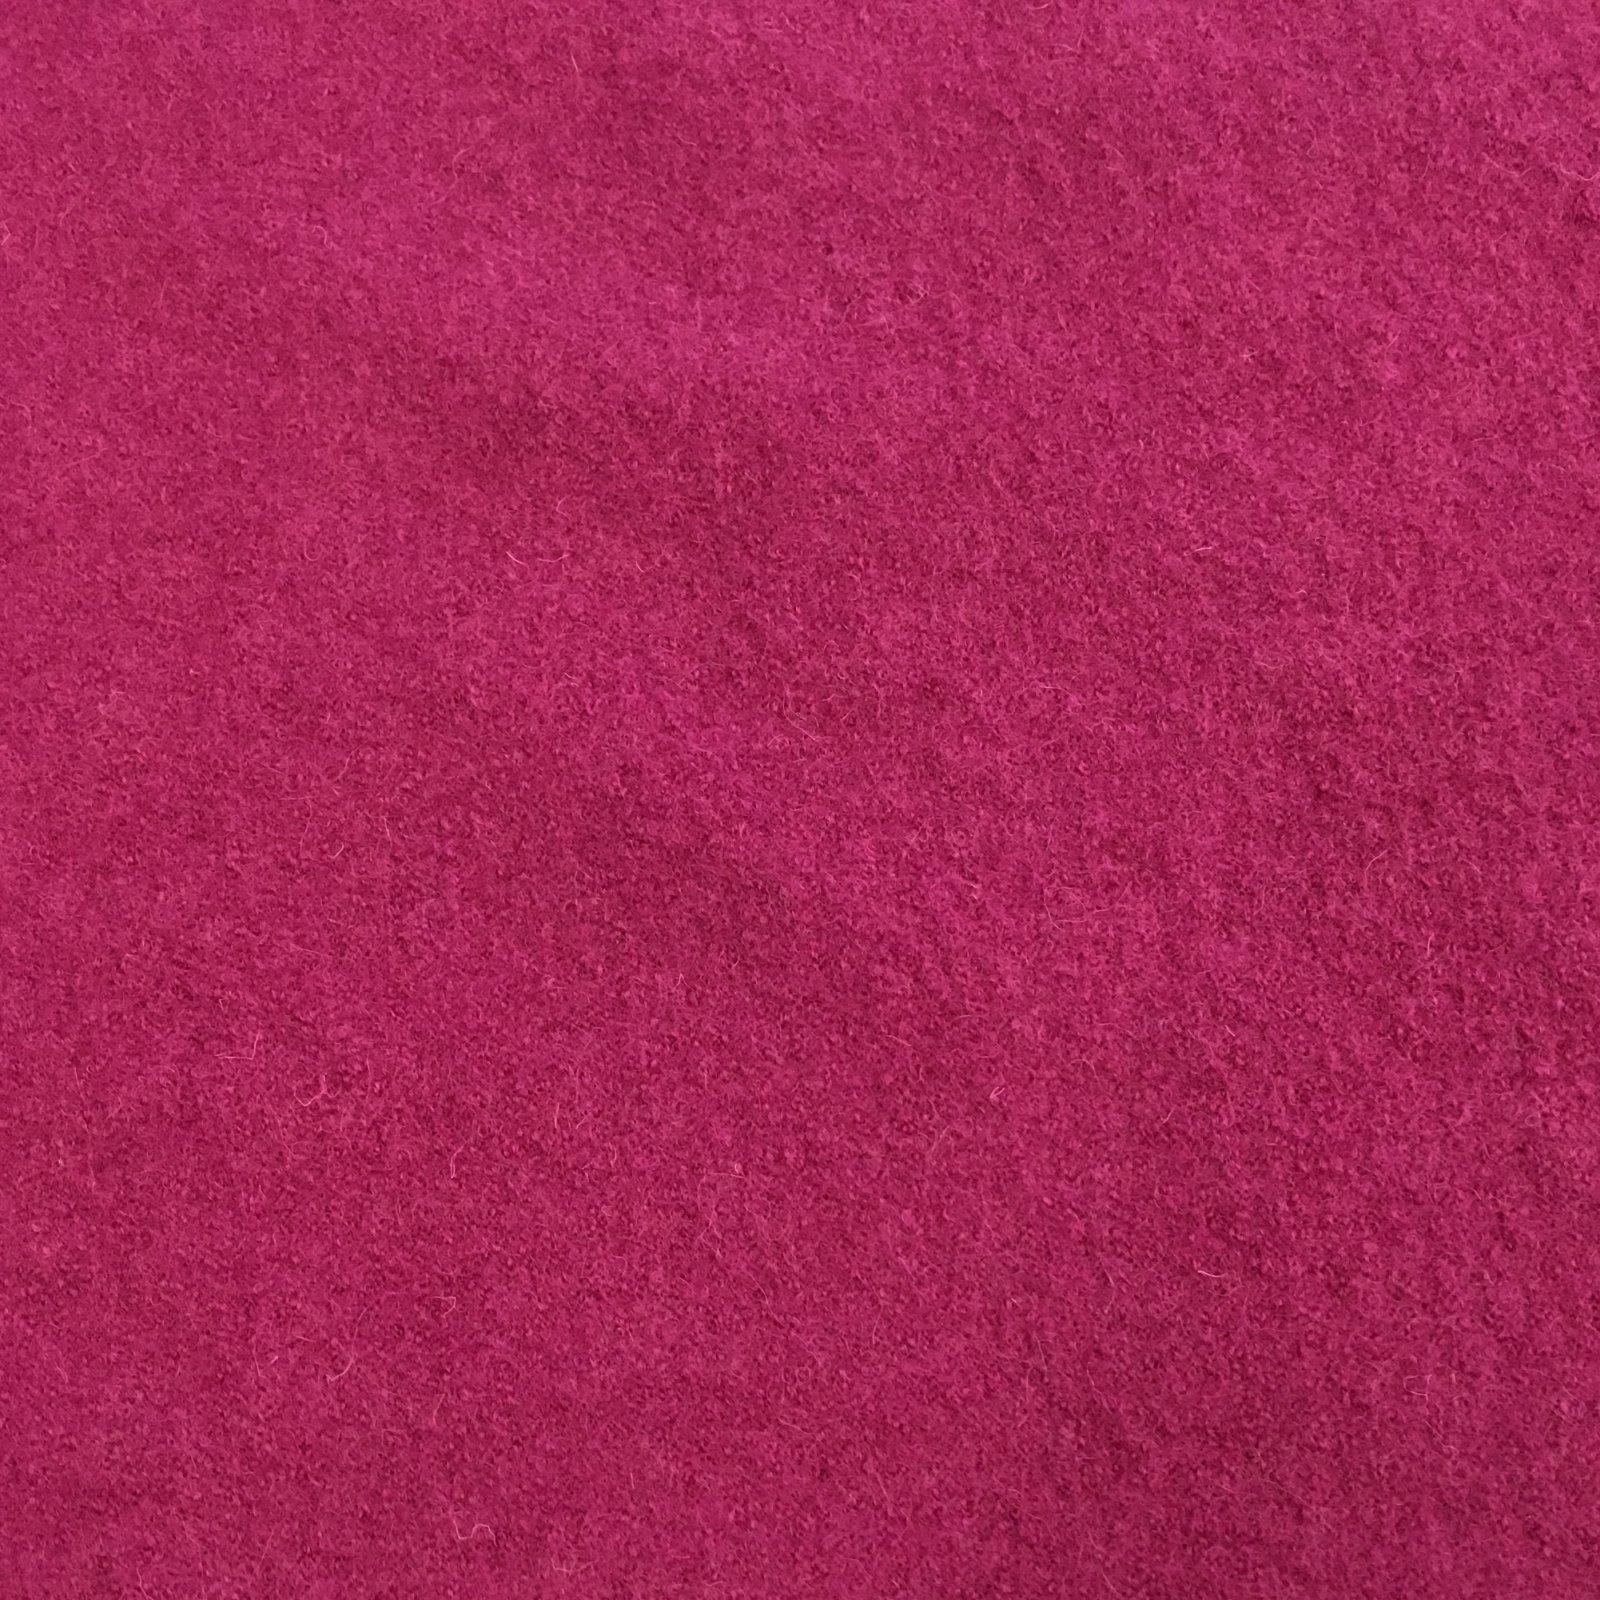 Boiled Wool - Fuchsia